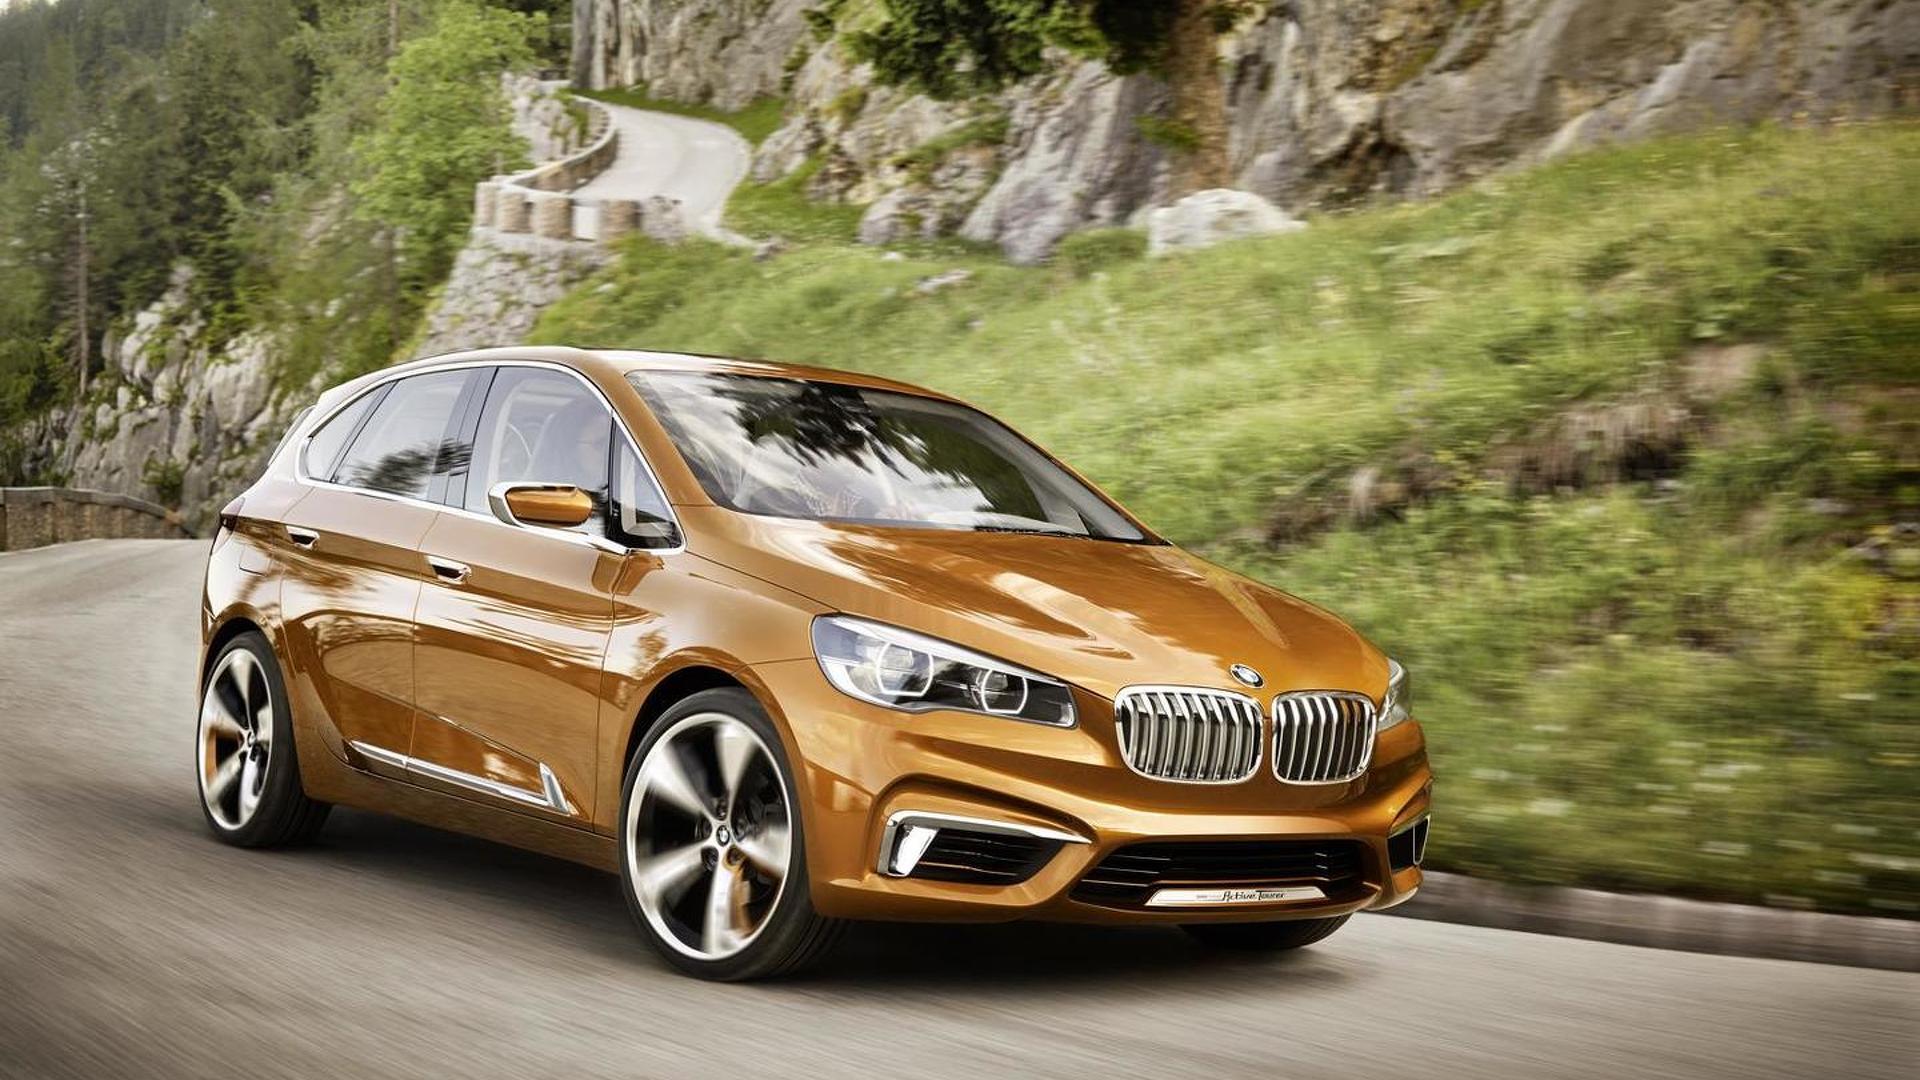 2013 BMW Concept Active Tourer Outdoor unveiled